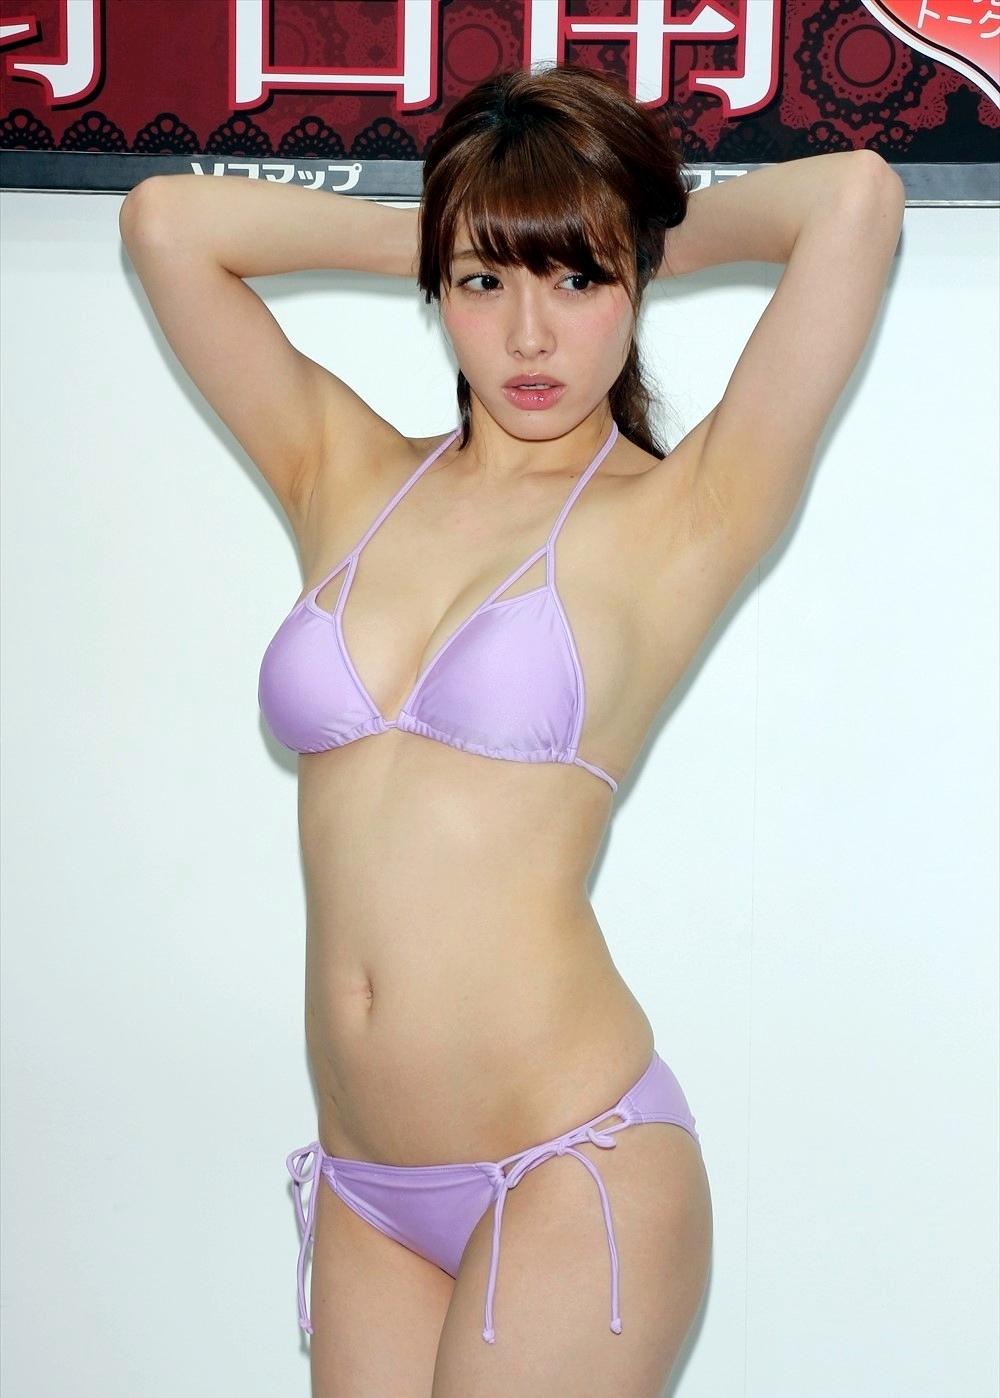 今野杏南の高画質美腋1 (3)